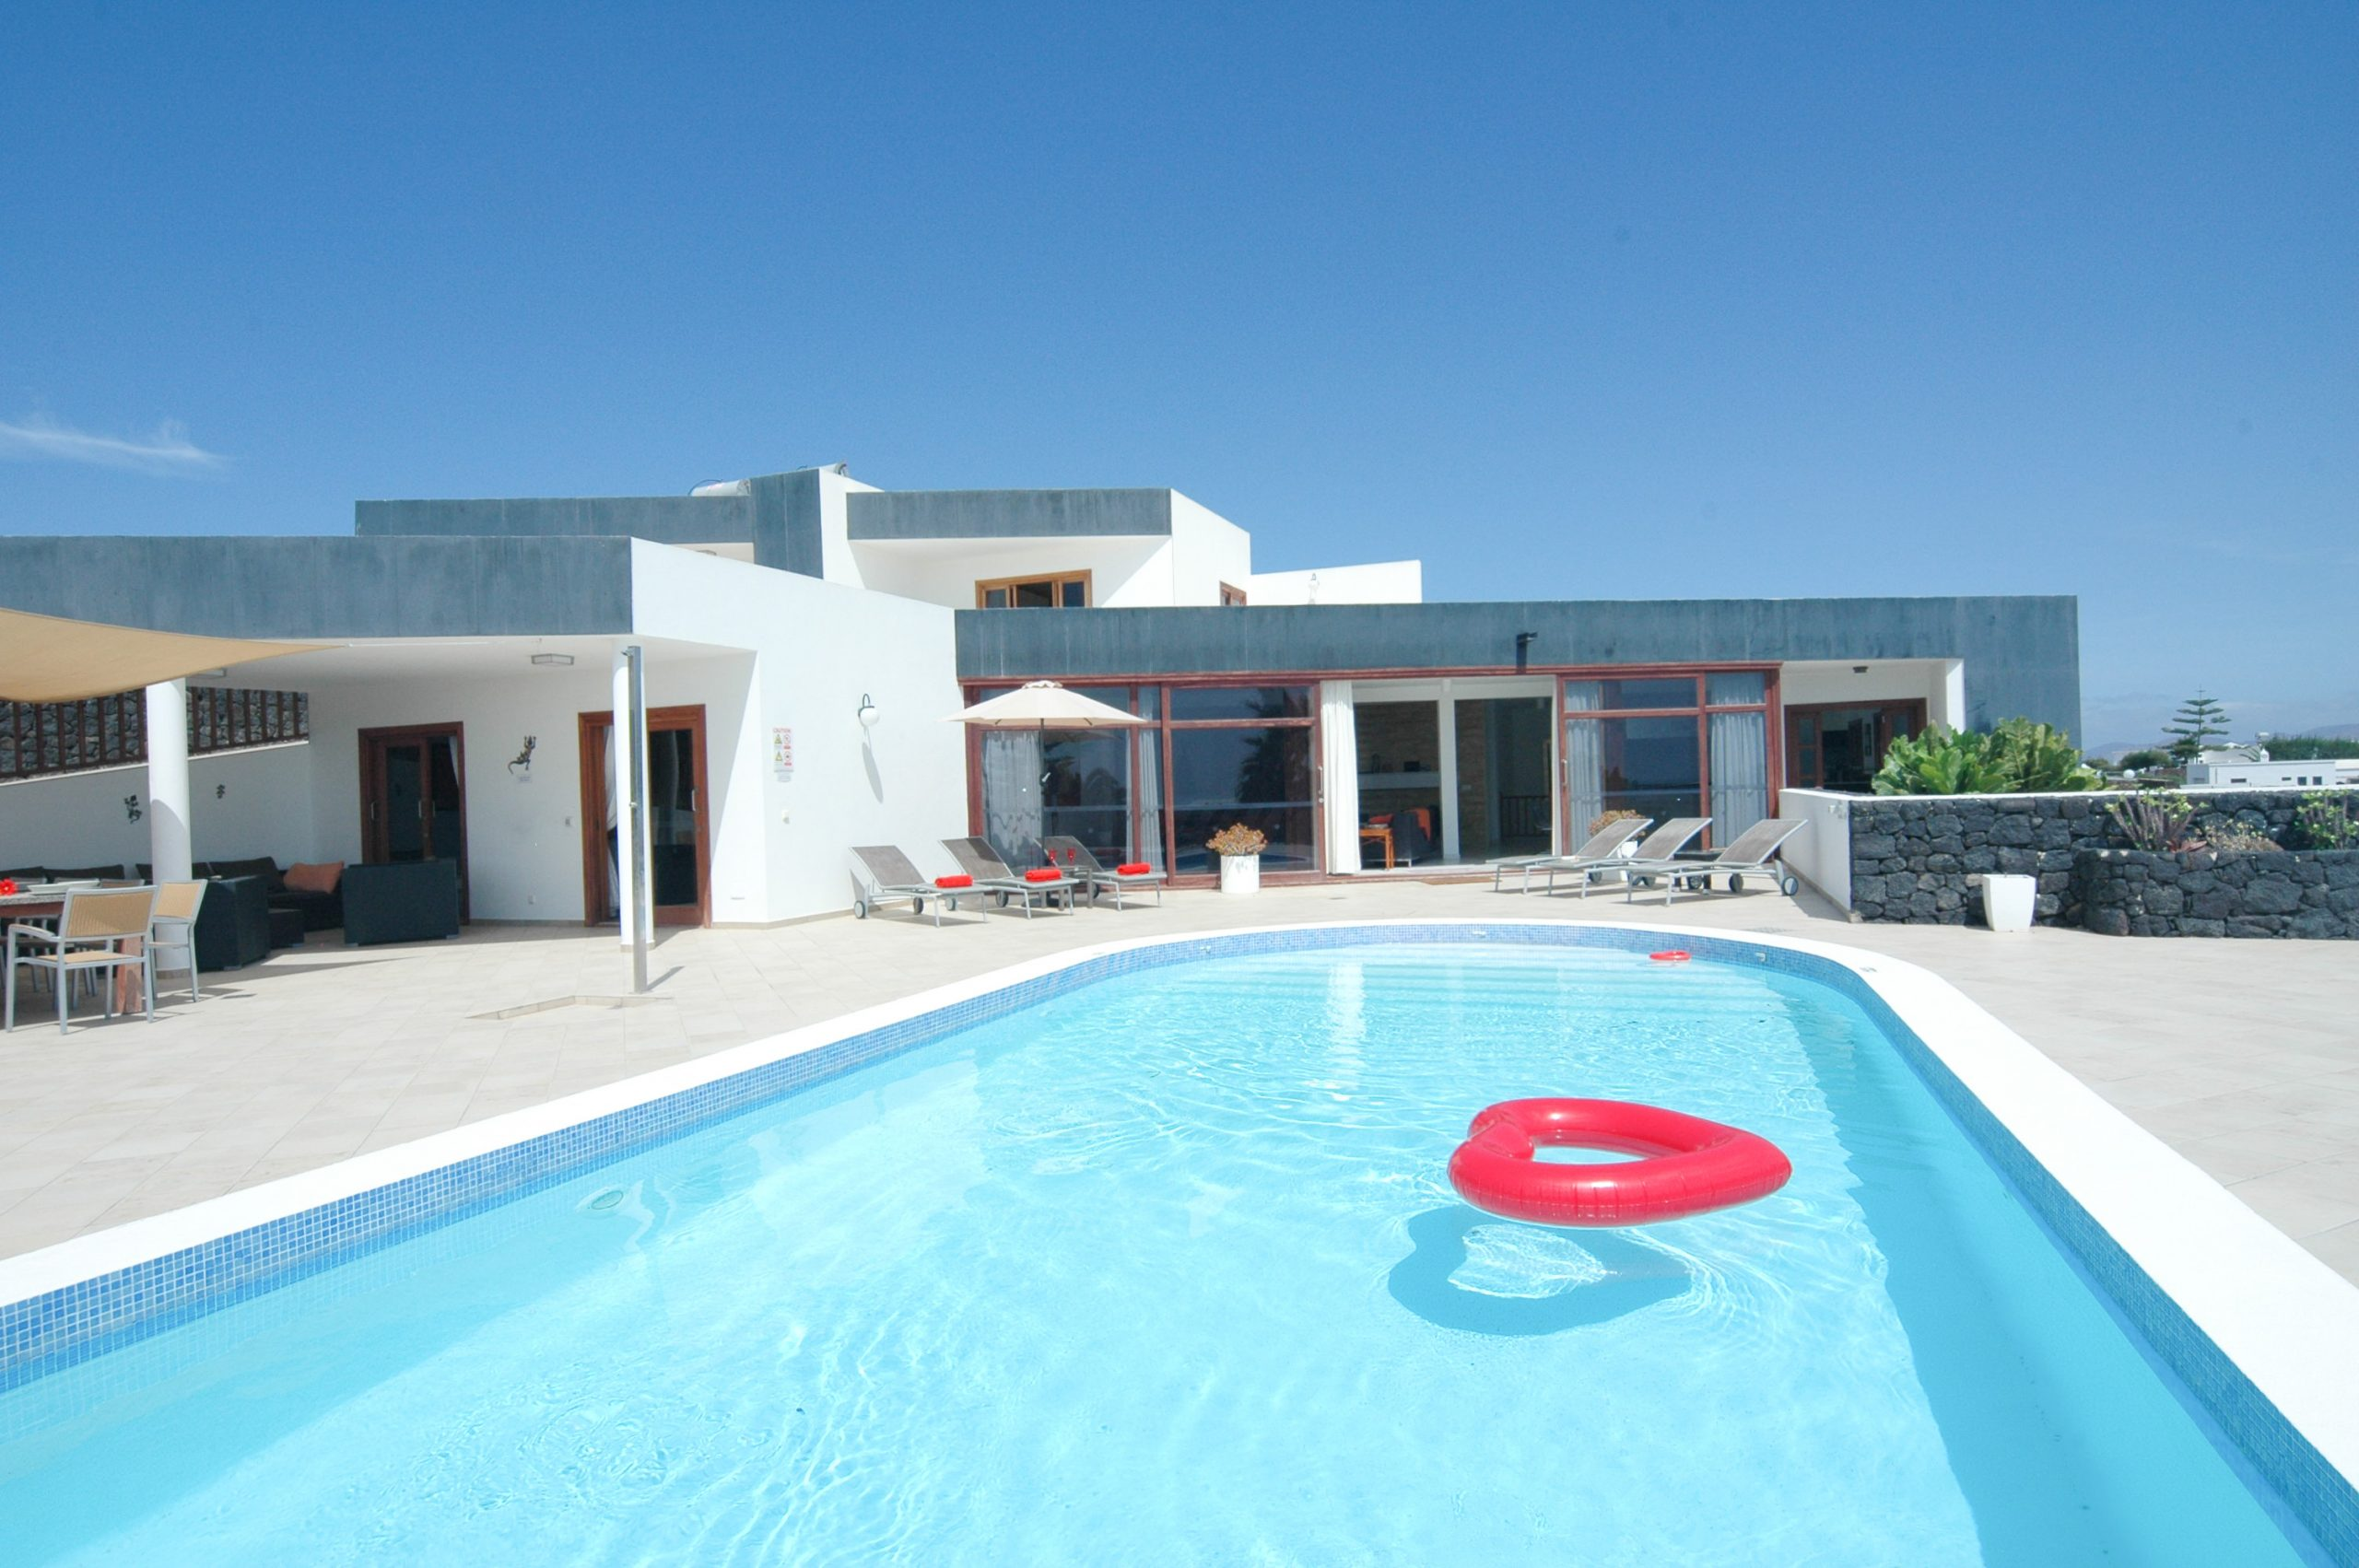 LVC216123 Pool area